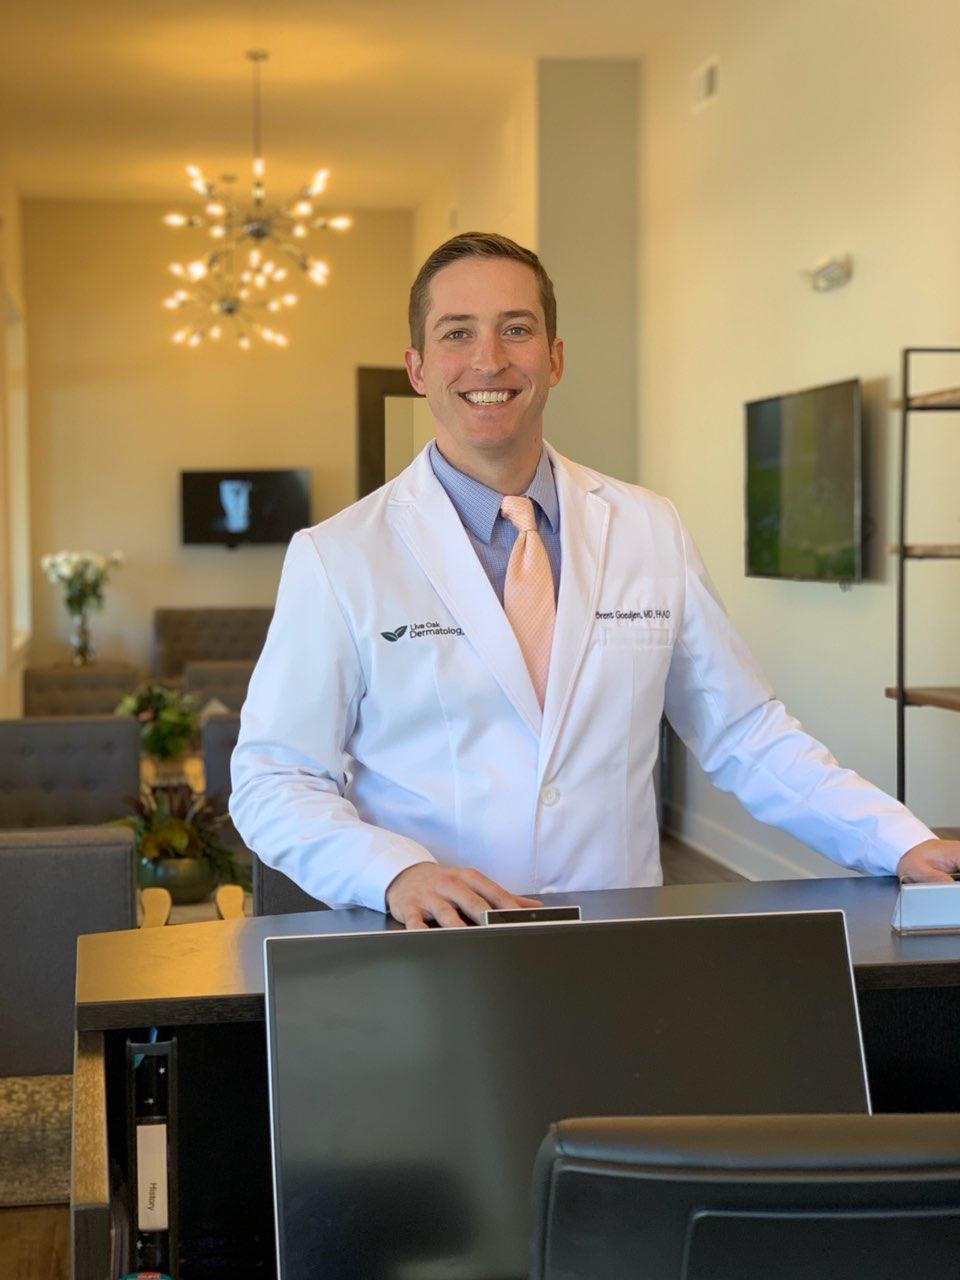 Brent Goedjen, Dermatologist, Roswell Georgia at Live Oak Dermatology